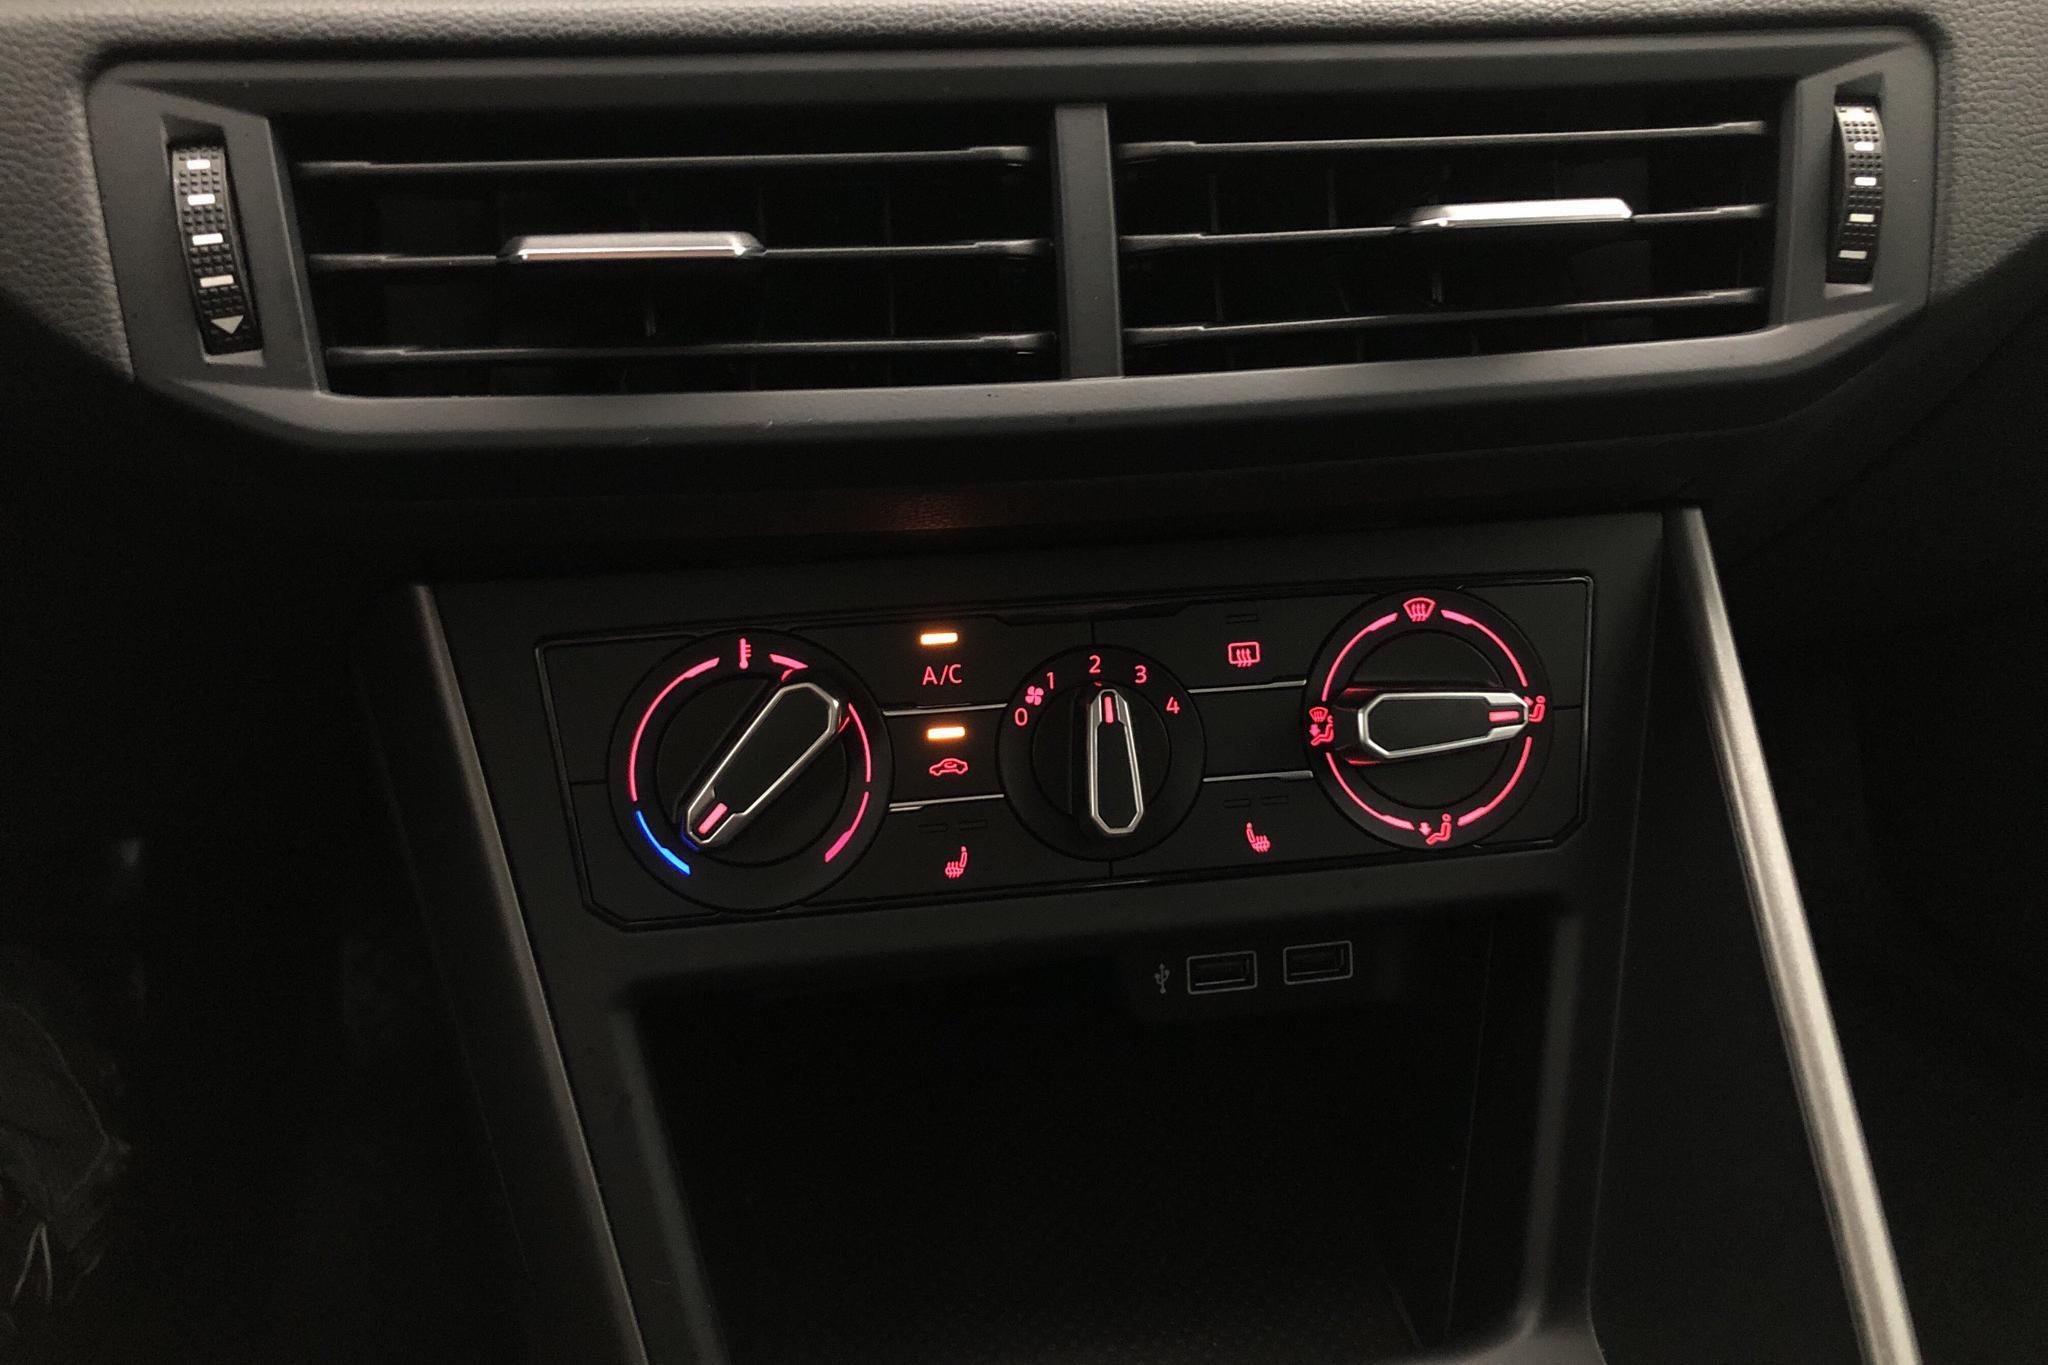 VW Polo 1.0 TSI 5dr (95hk) - 3 081 mil - Manuell - Dark Grey - 2018